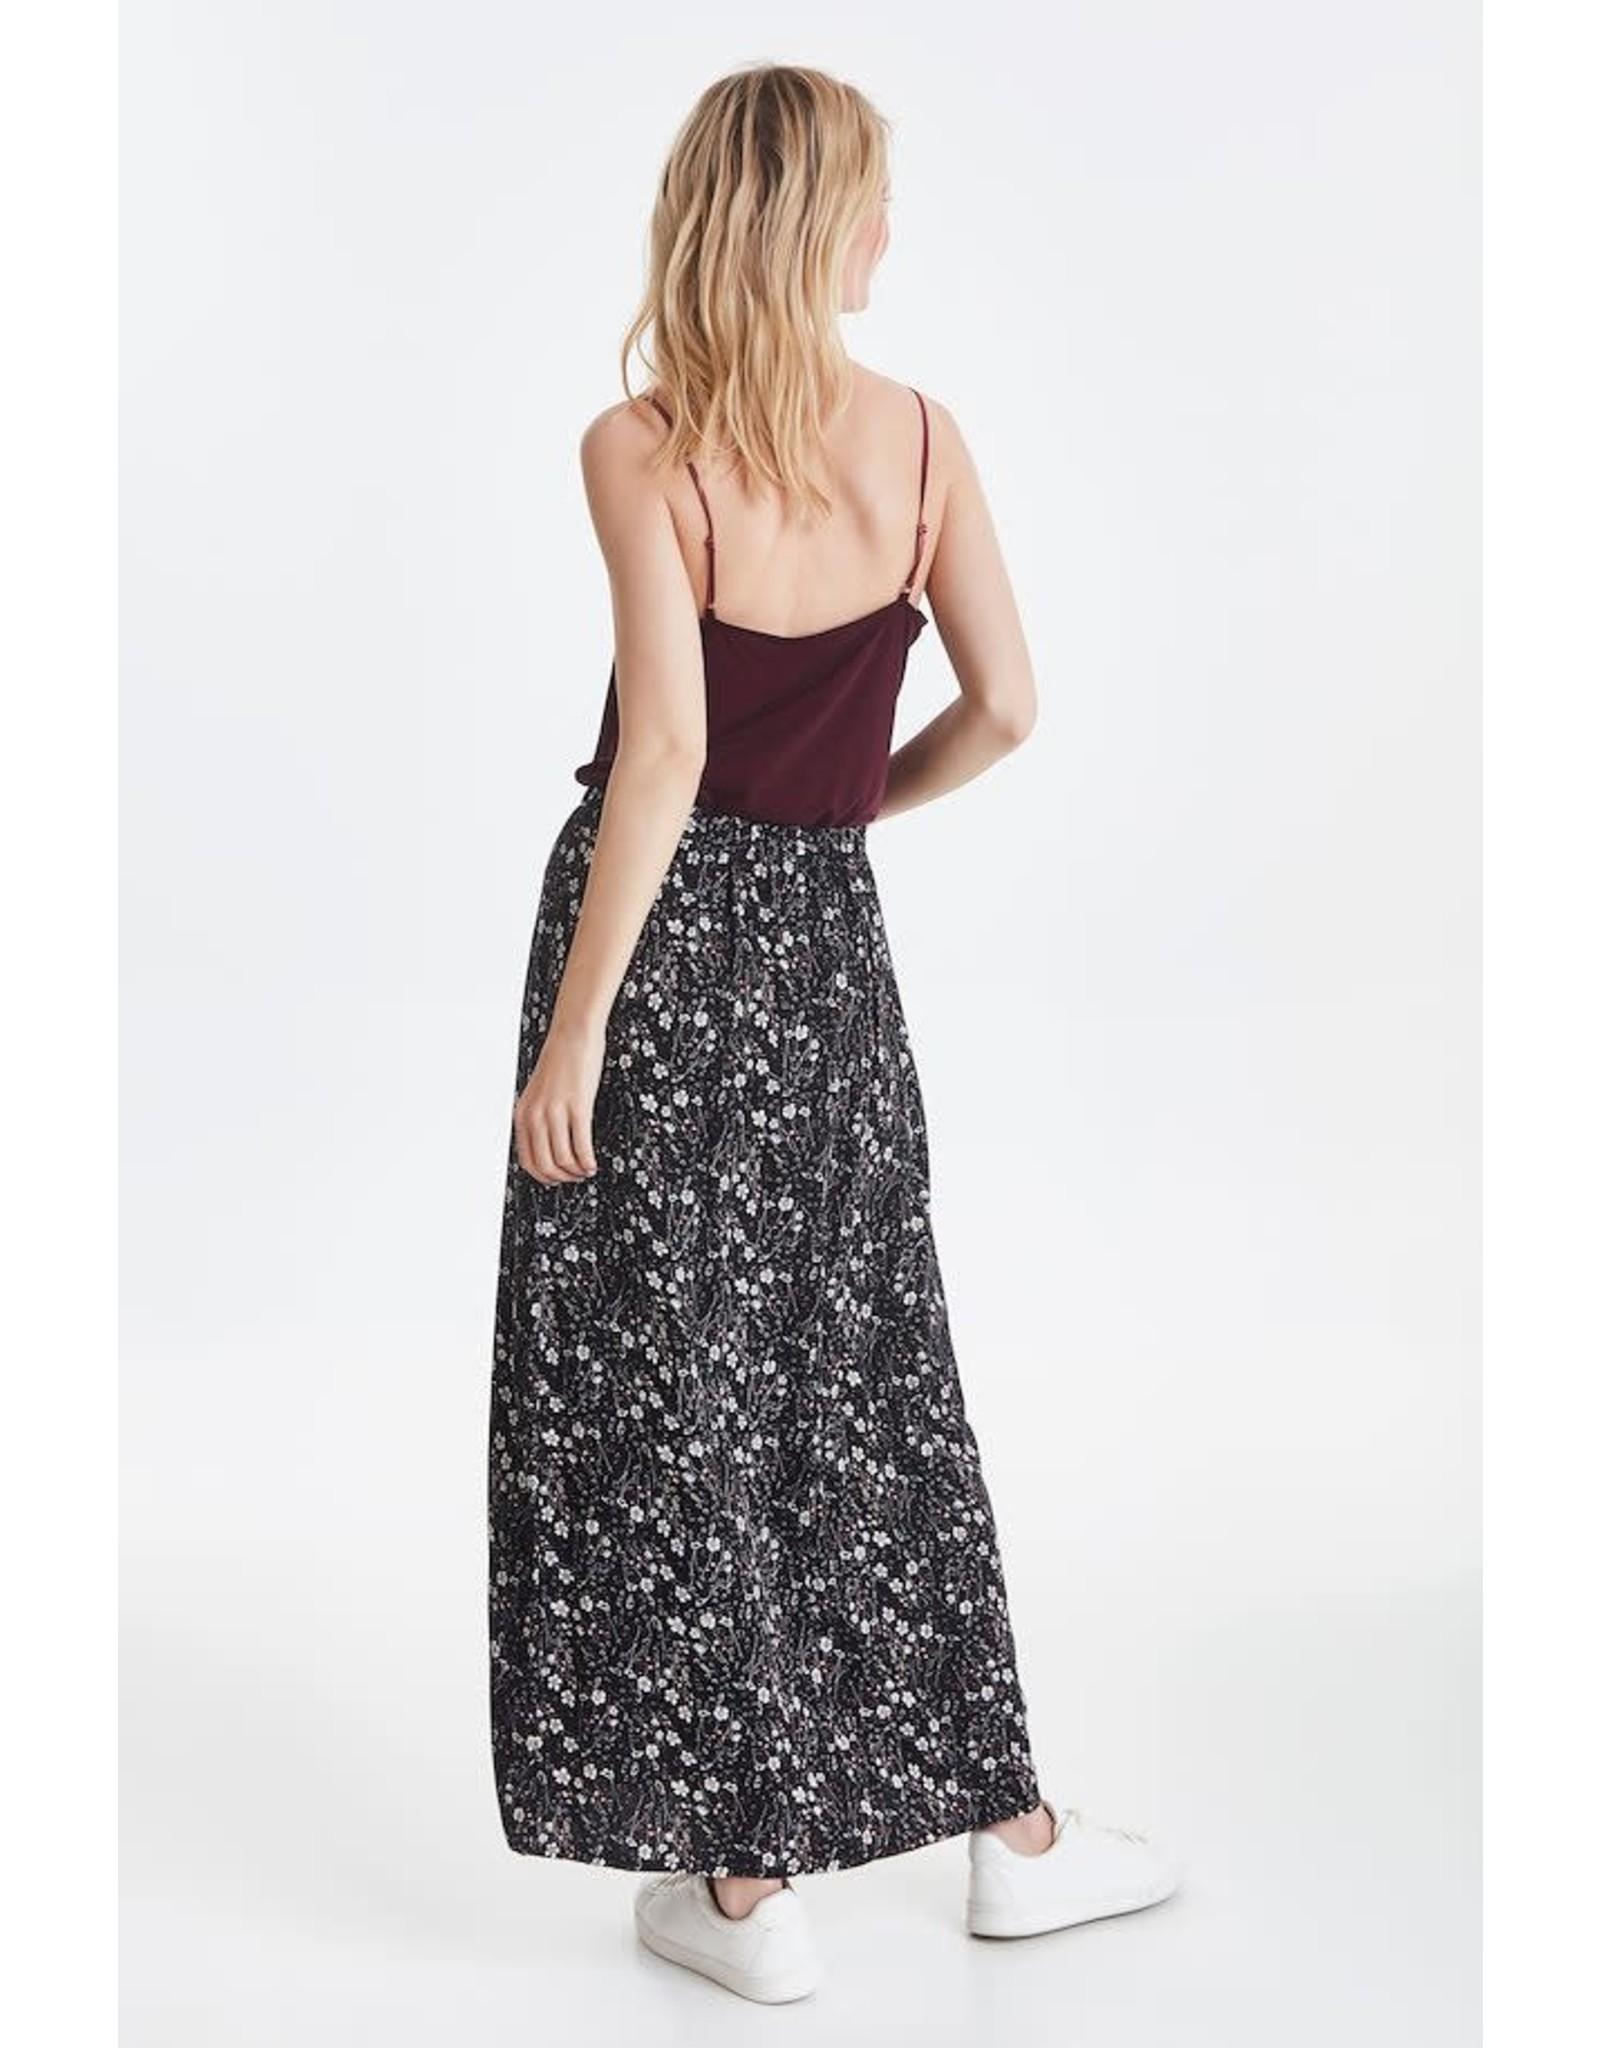 ICHI ICHI - 90s Floral Maxi Skirt